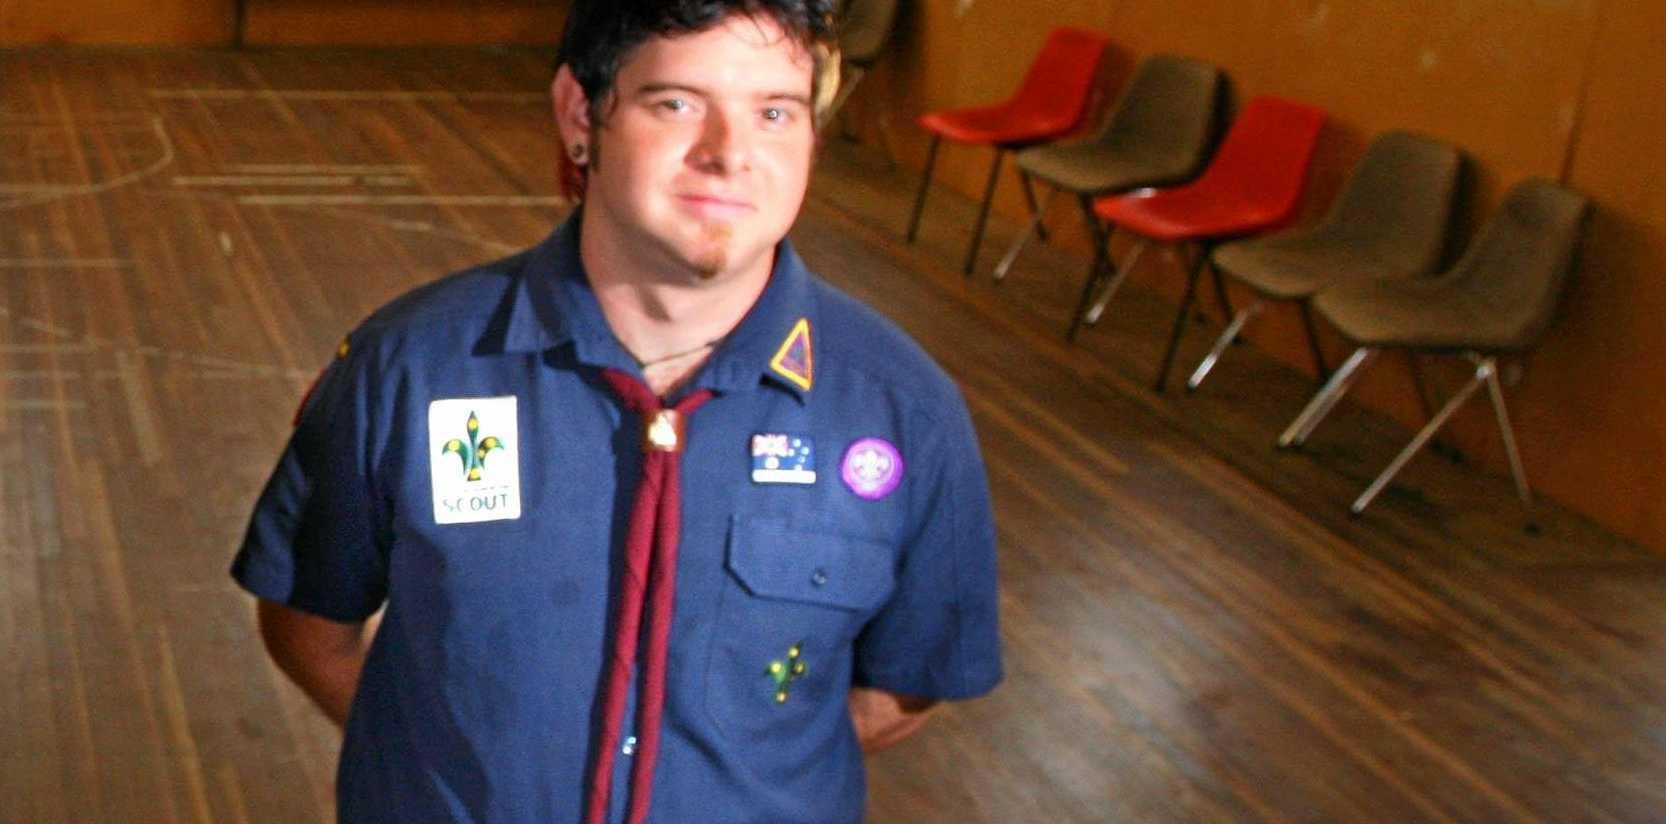 Leader Brock Dittman .